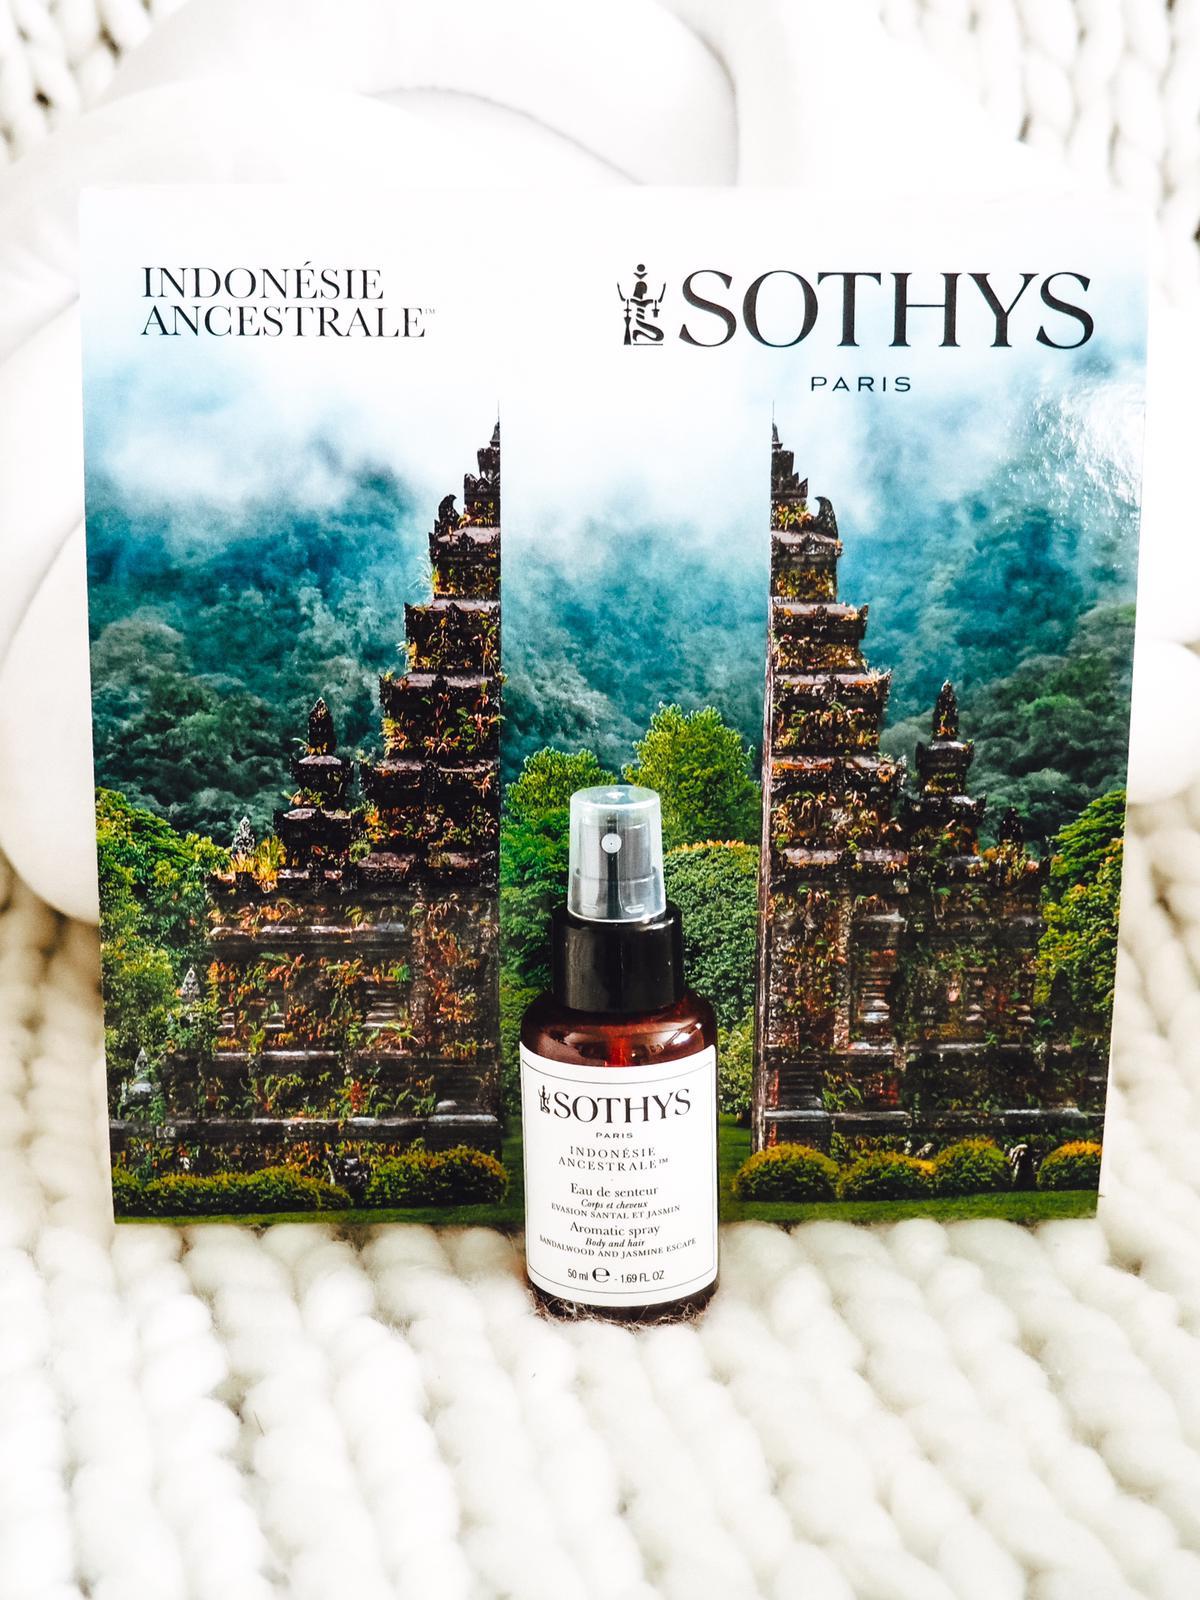 Sothys Paris - Indonésie Ancestrale Duftspray